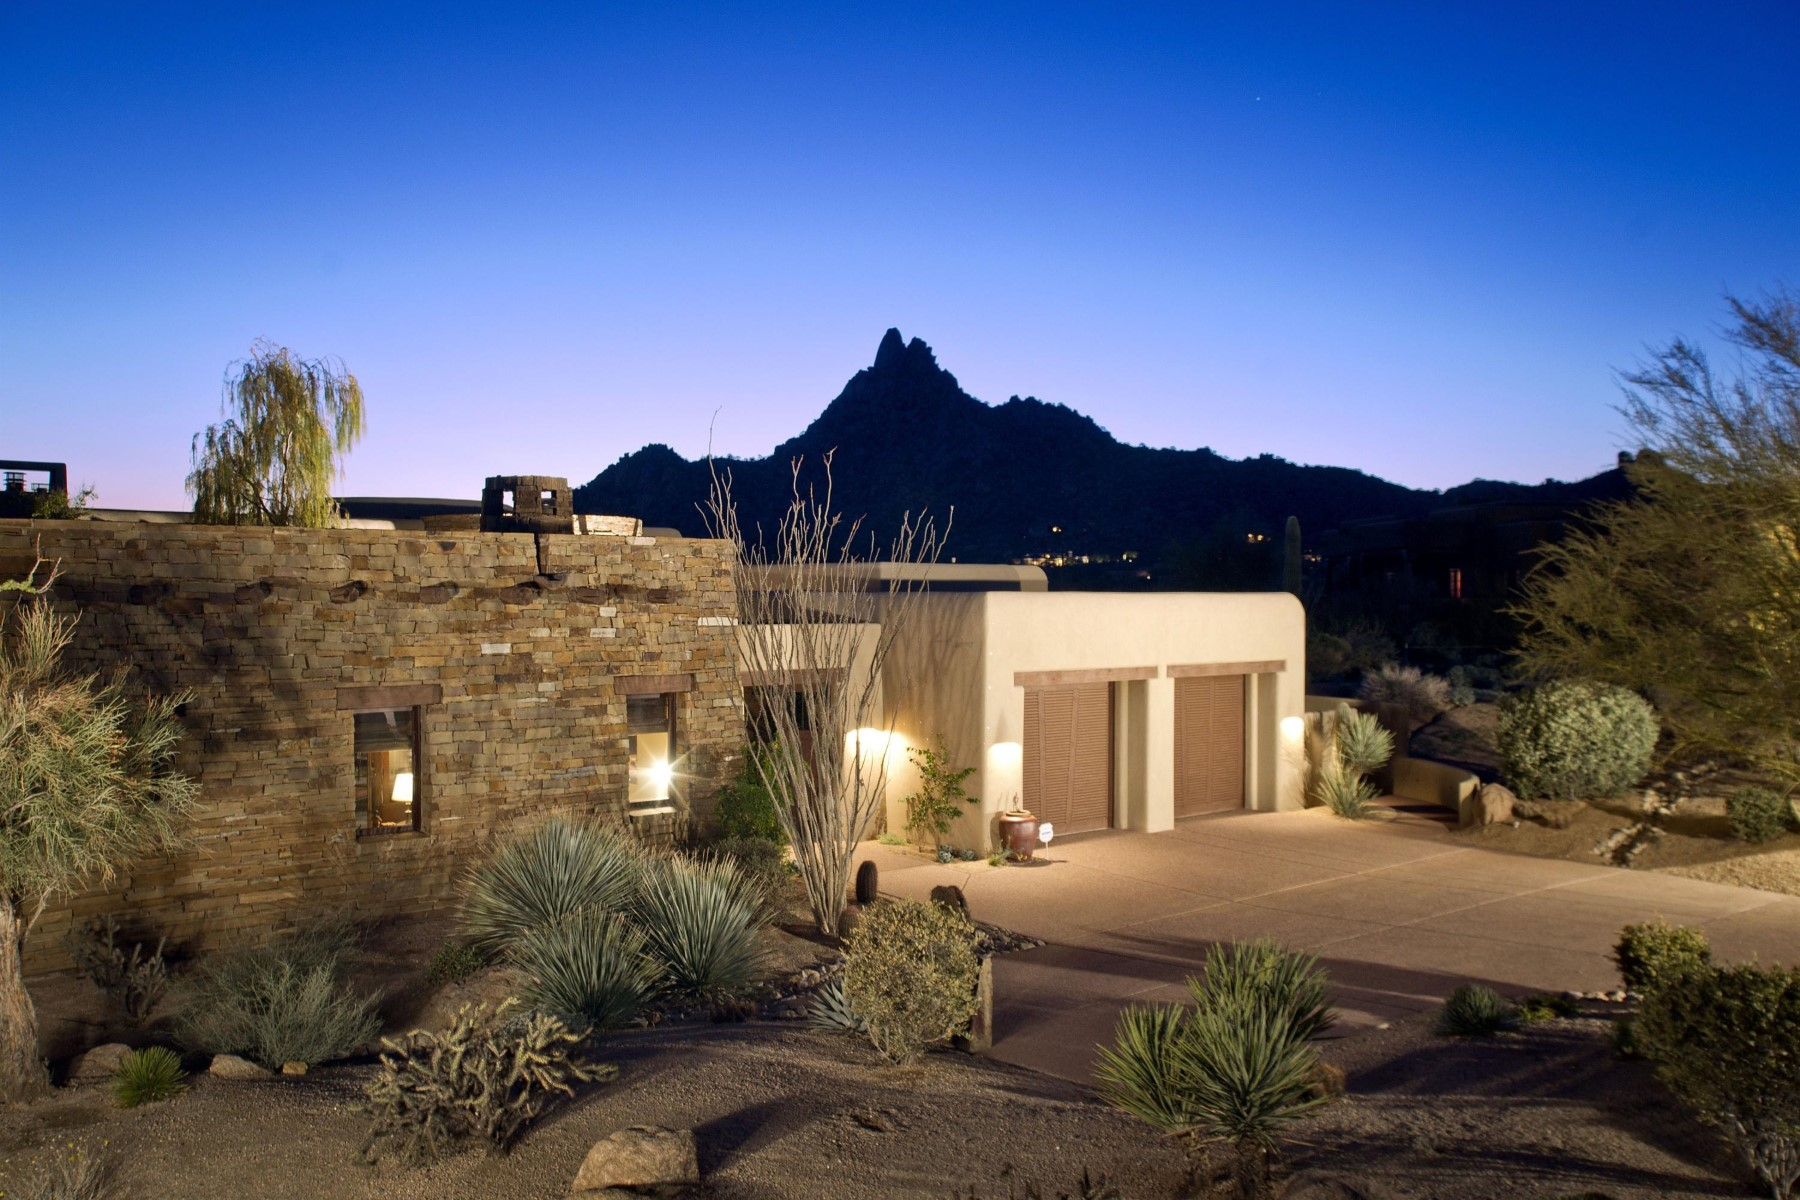 Moradia para Venda às One-of-a-kind custom territorial in Privada 10585 E Crescent Moon Dr 6 Scottsdale, Arizona, 85262 Estados Unidos